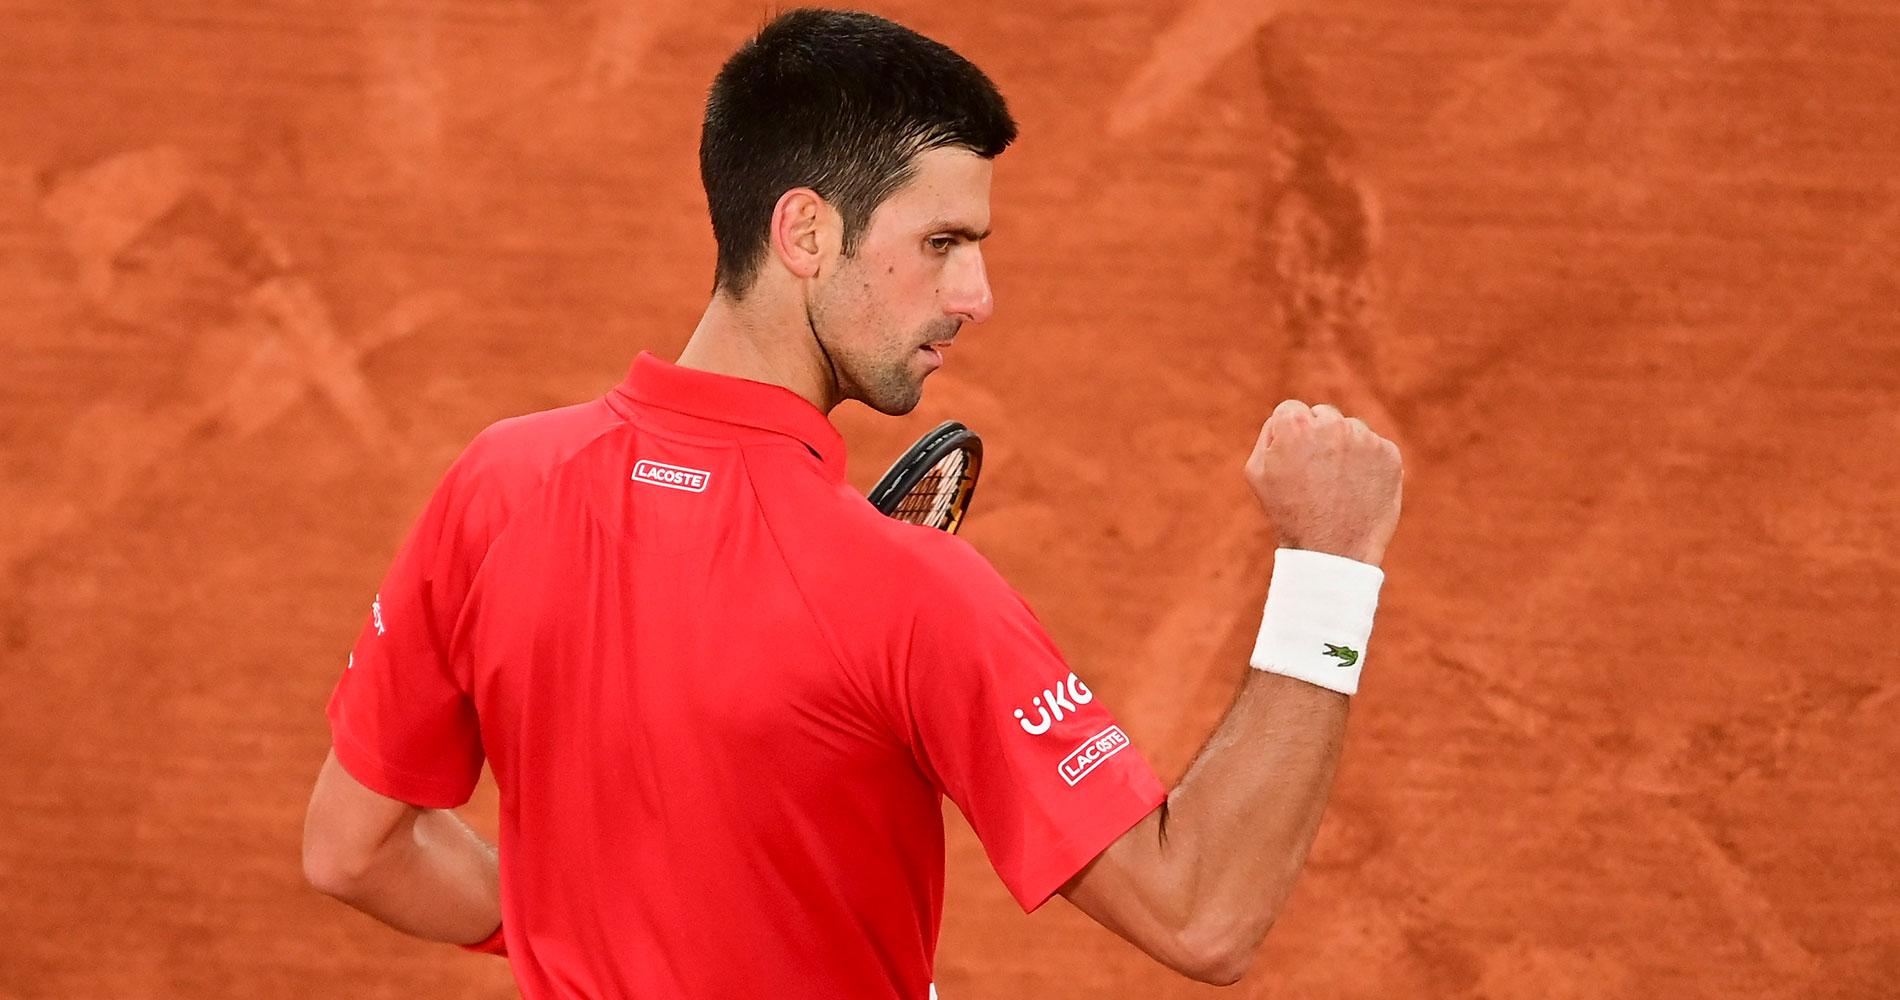 Novak Djokovic at Roland-Garros 2020 round 4